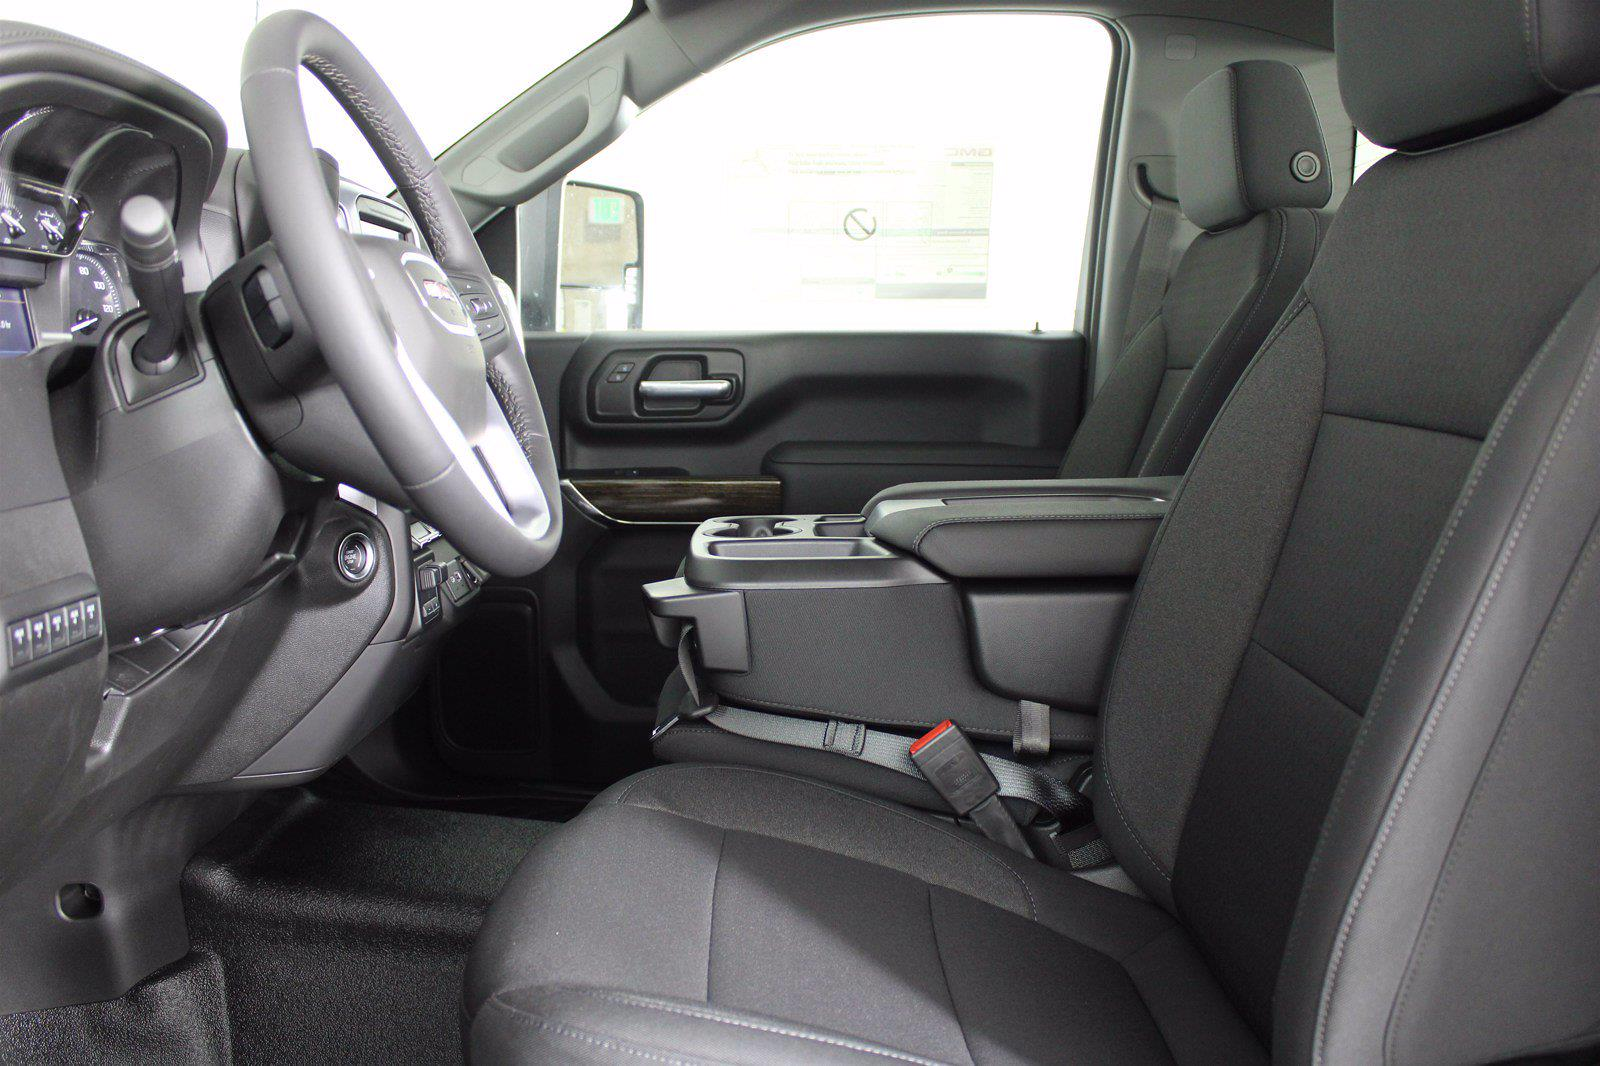 2022 Sierra 2500 Regular Cab 4x4,  Pickup #D420025 - photo 15